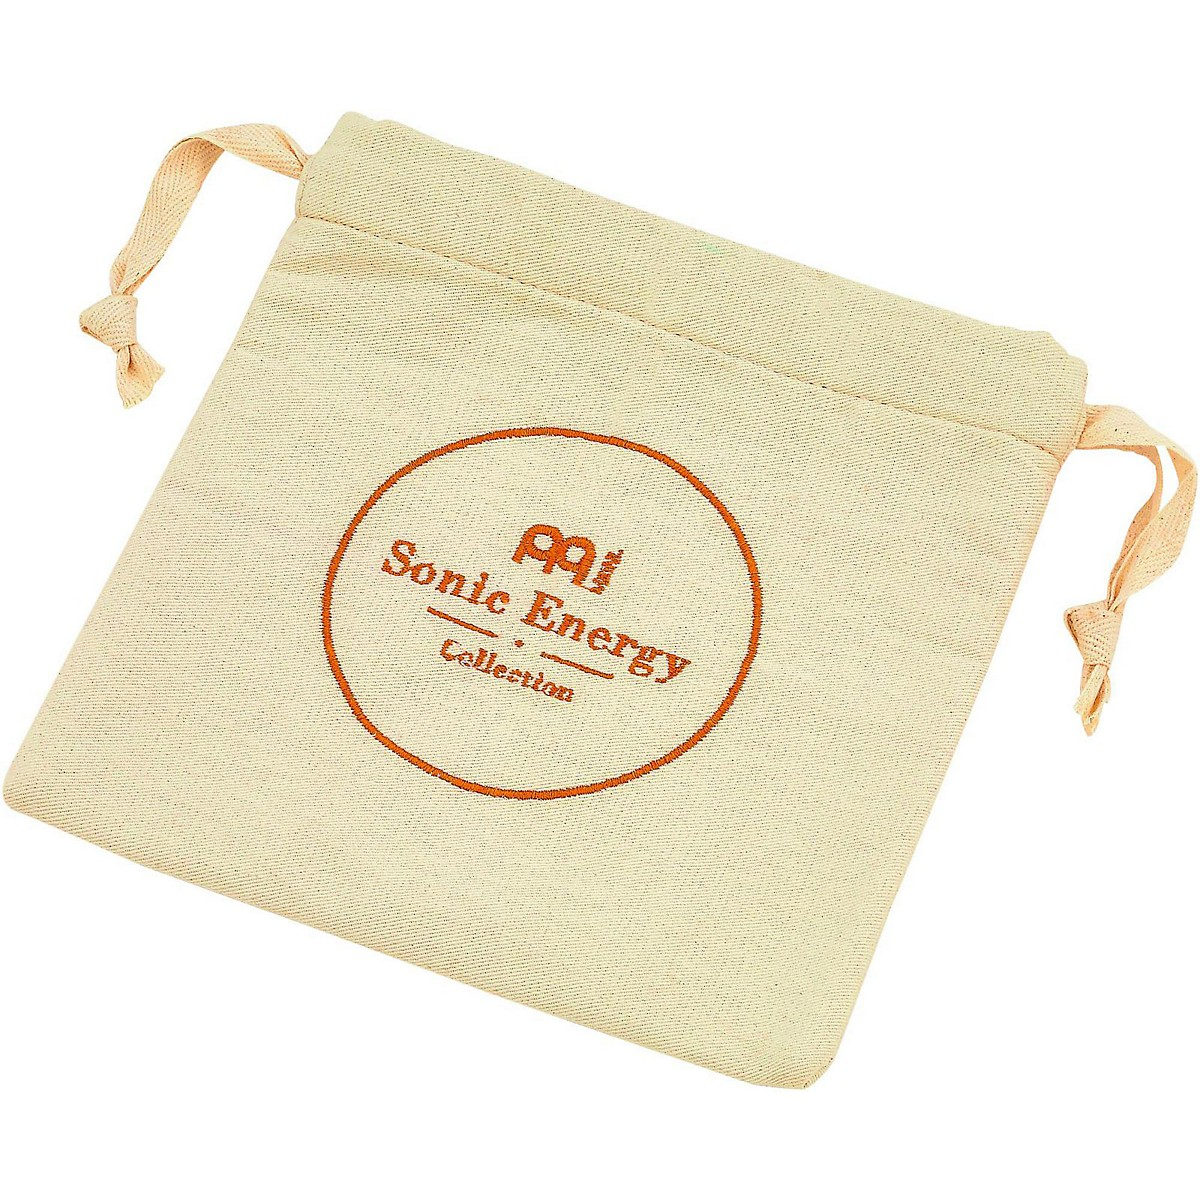 Meinl Sonic Energy Singing Bowl Cotton Bag